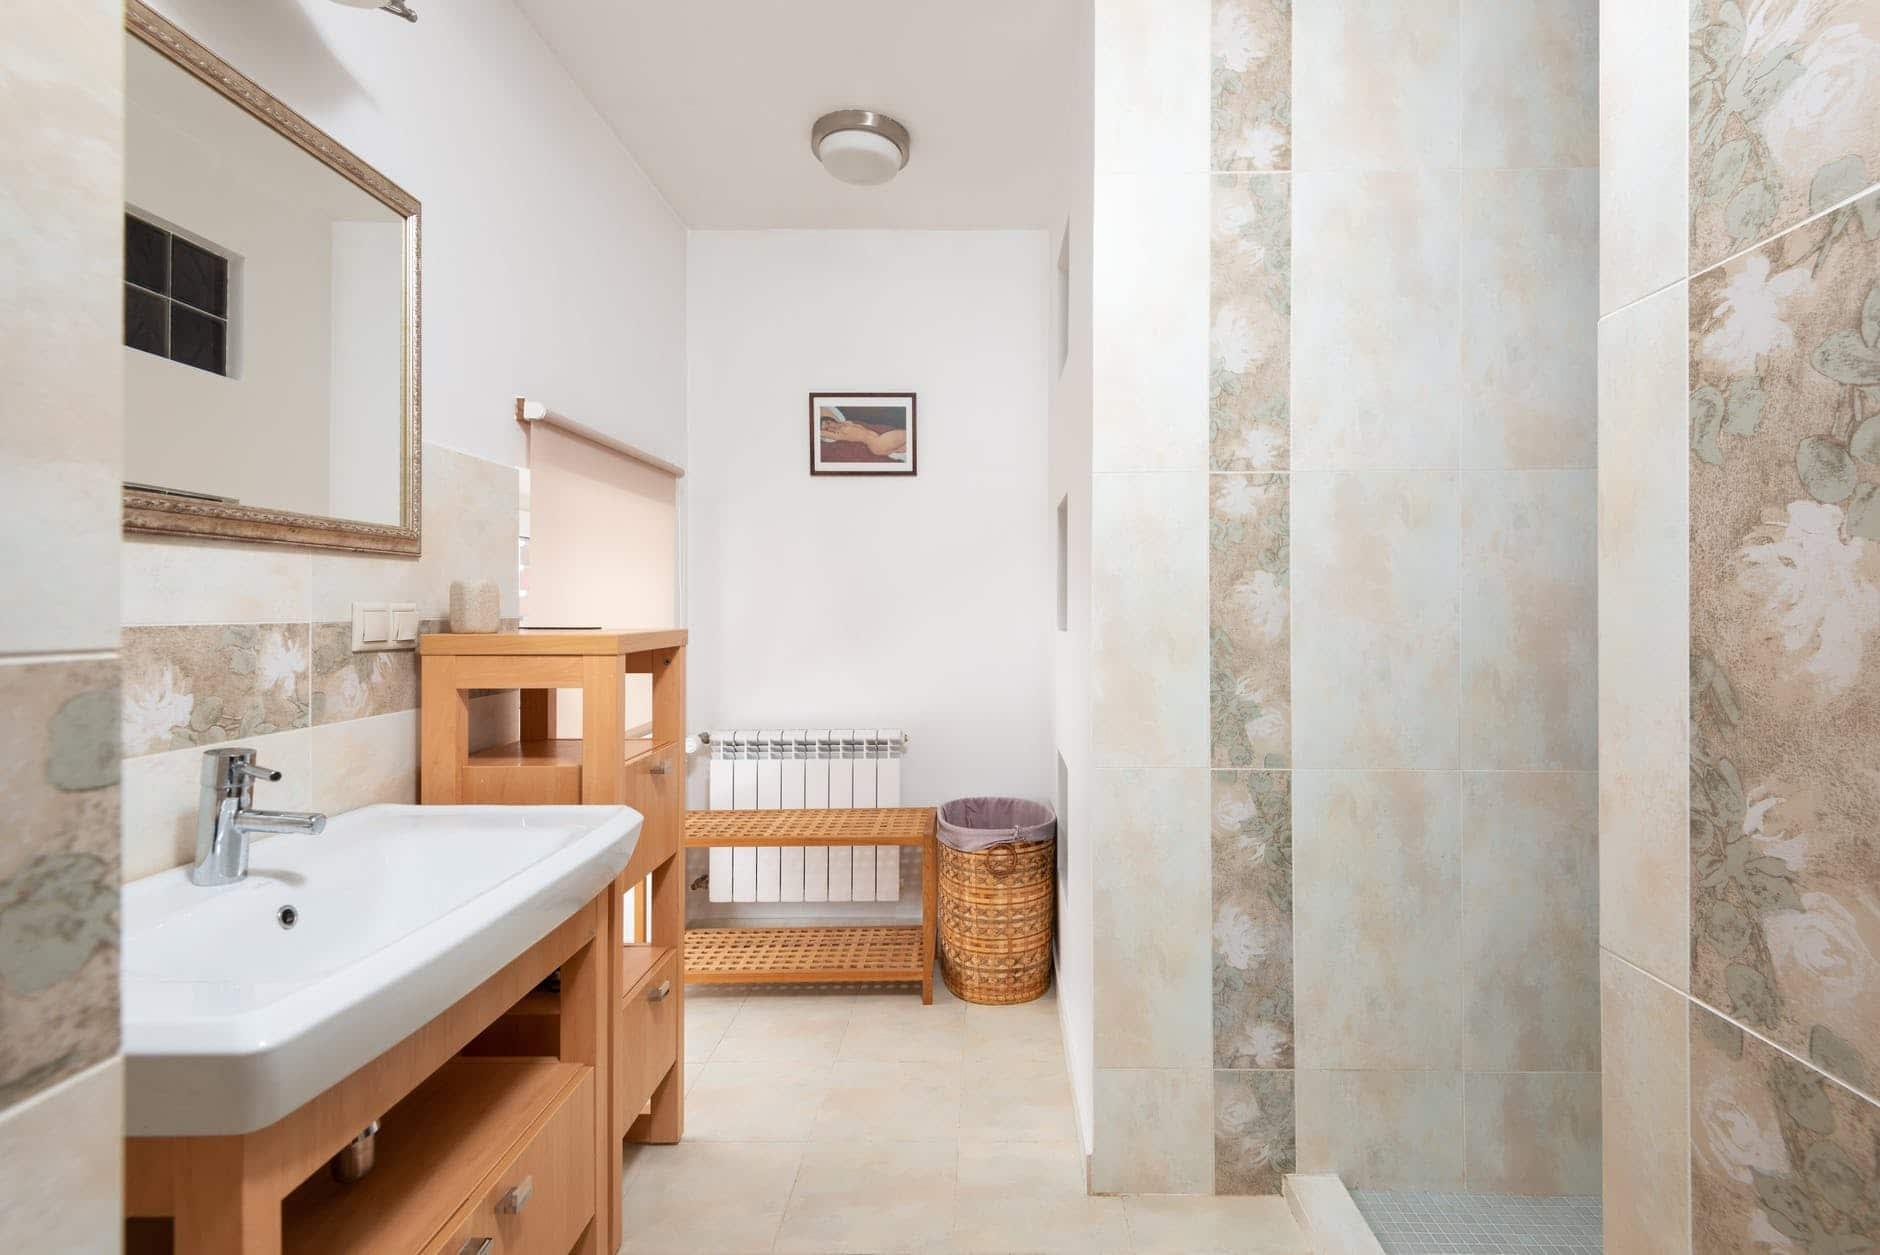 bathroom rennovation services